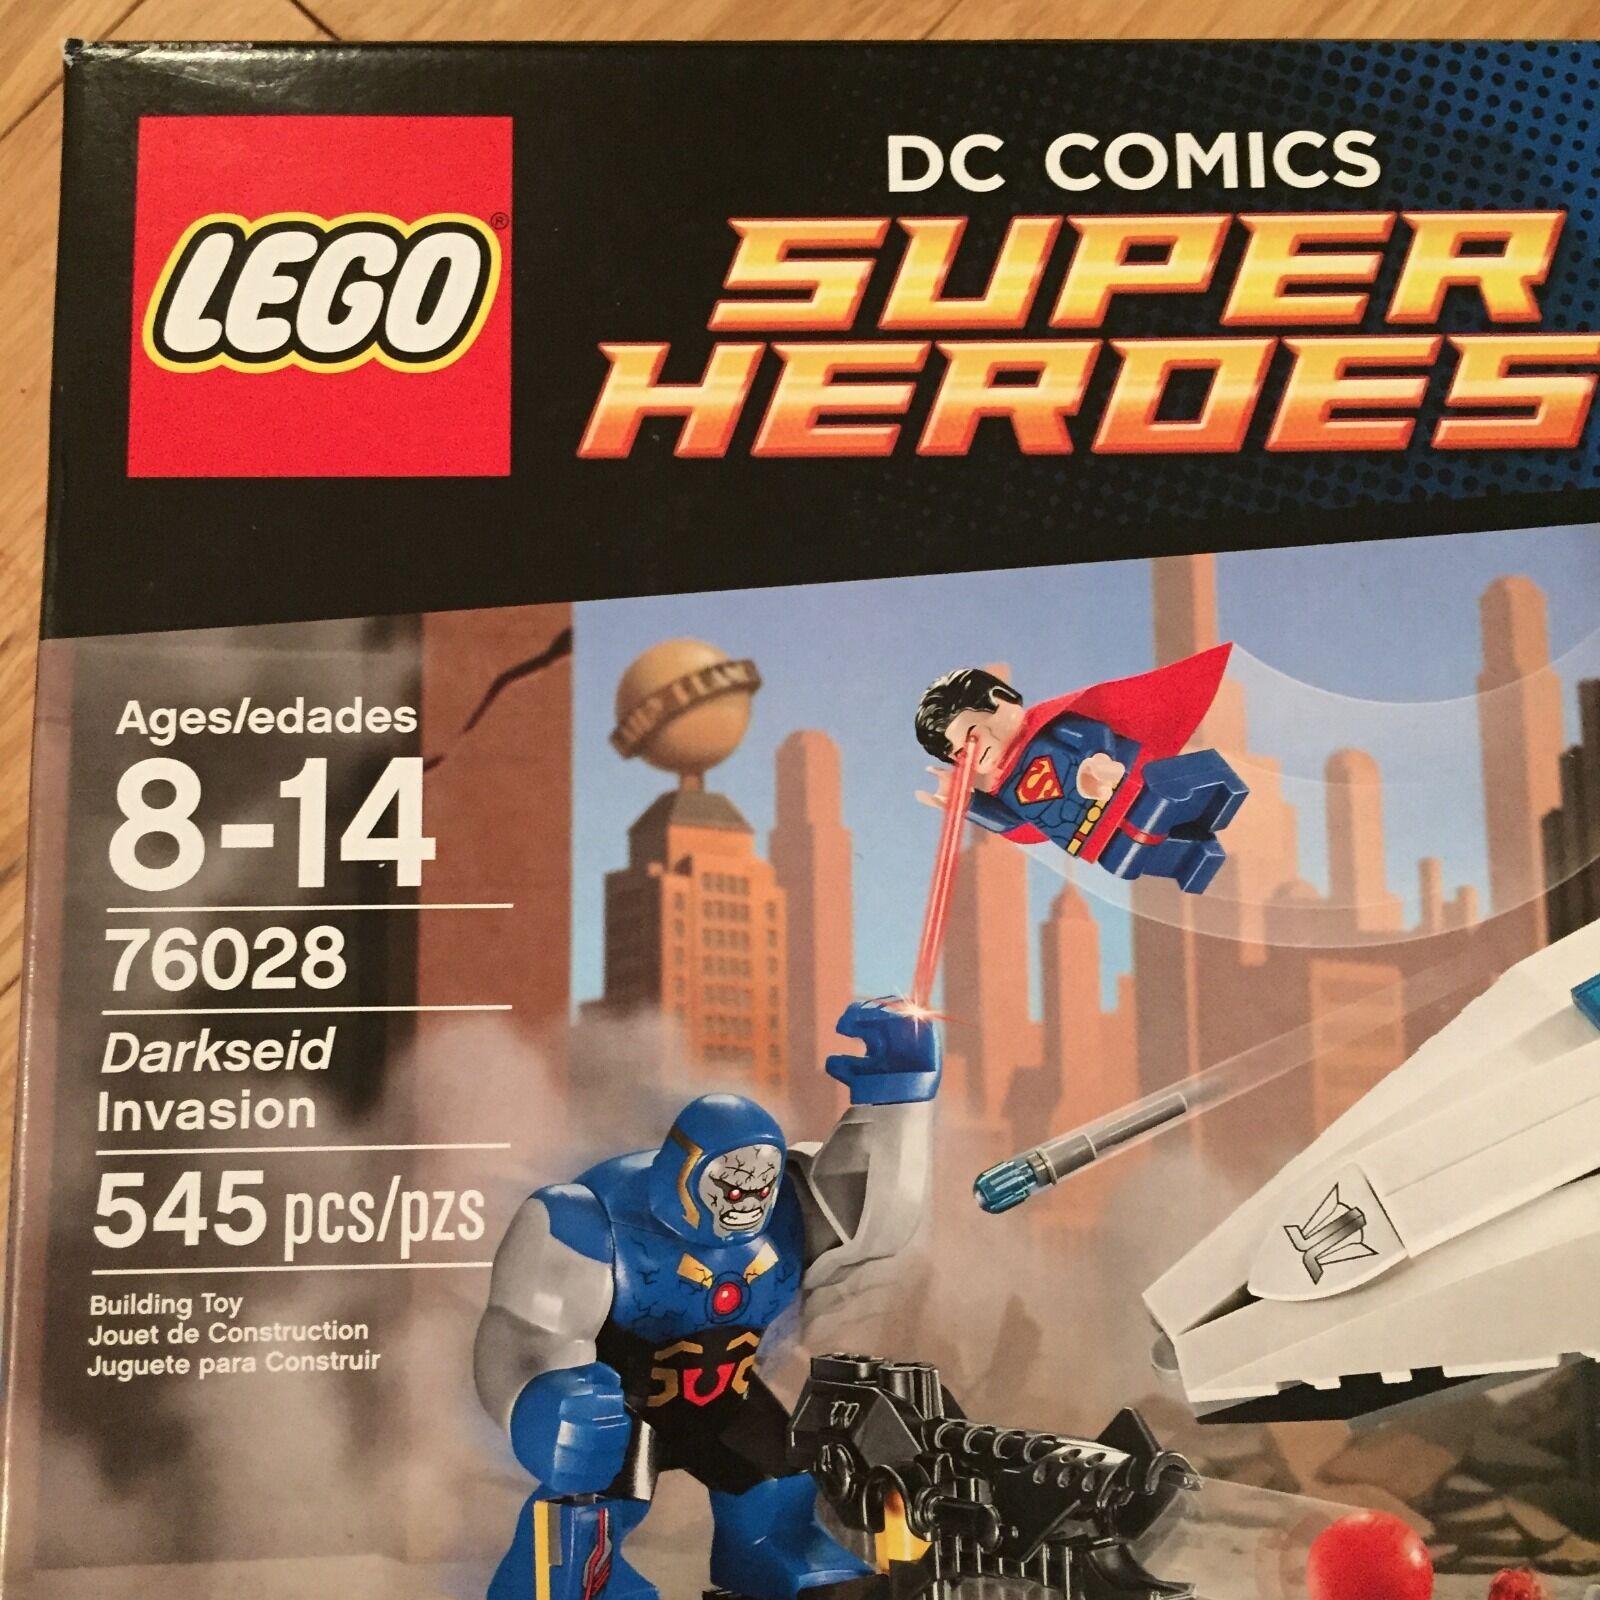 Lego 76028 Darkseid Invasion - - - Superman Justice League DC Comics Set Toys Cyborg 00fb08